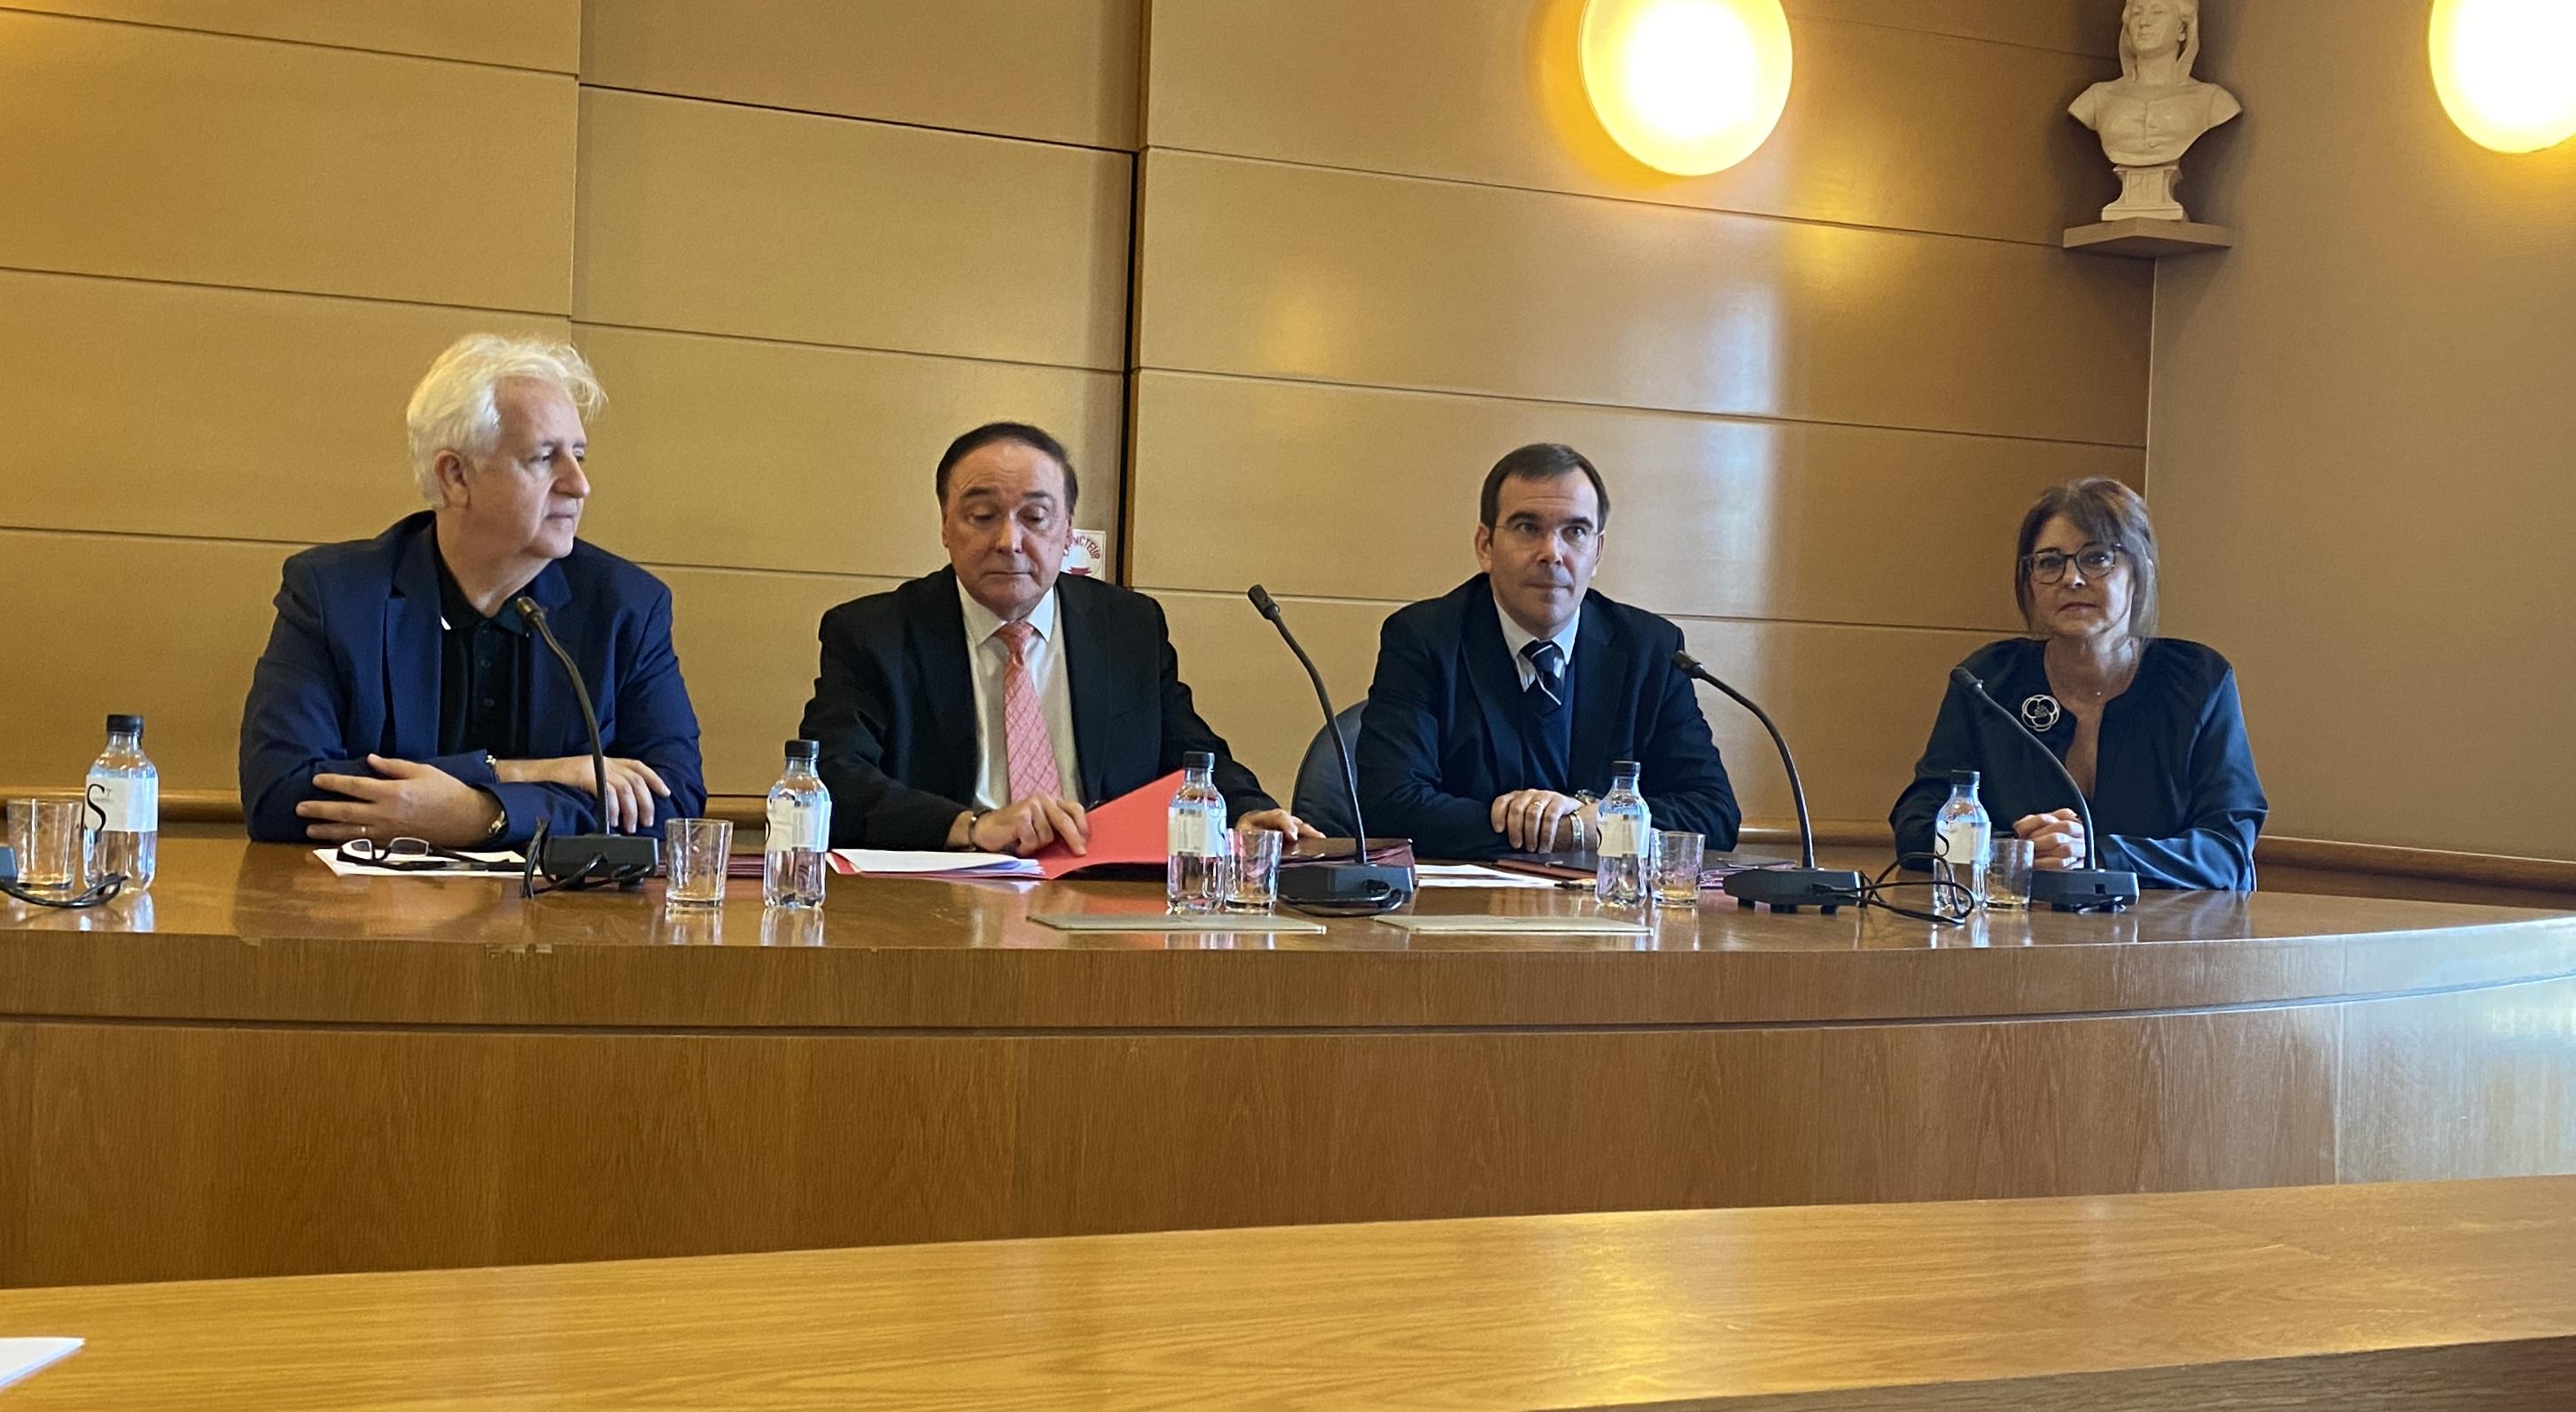 La médiation au tribunal administratif de Bastia : les ordres des avocats adhèrent